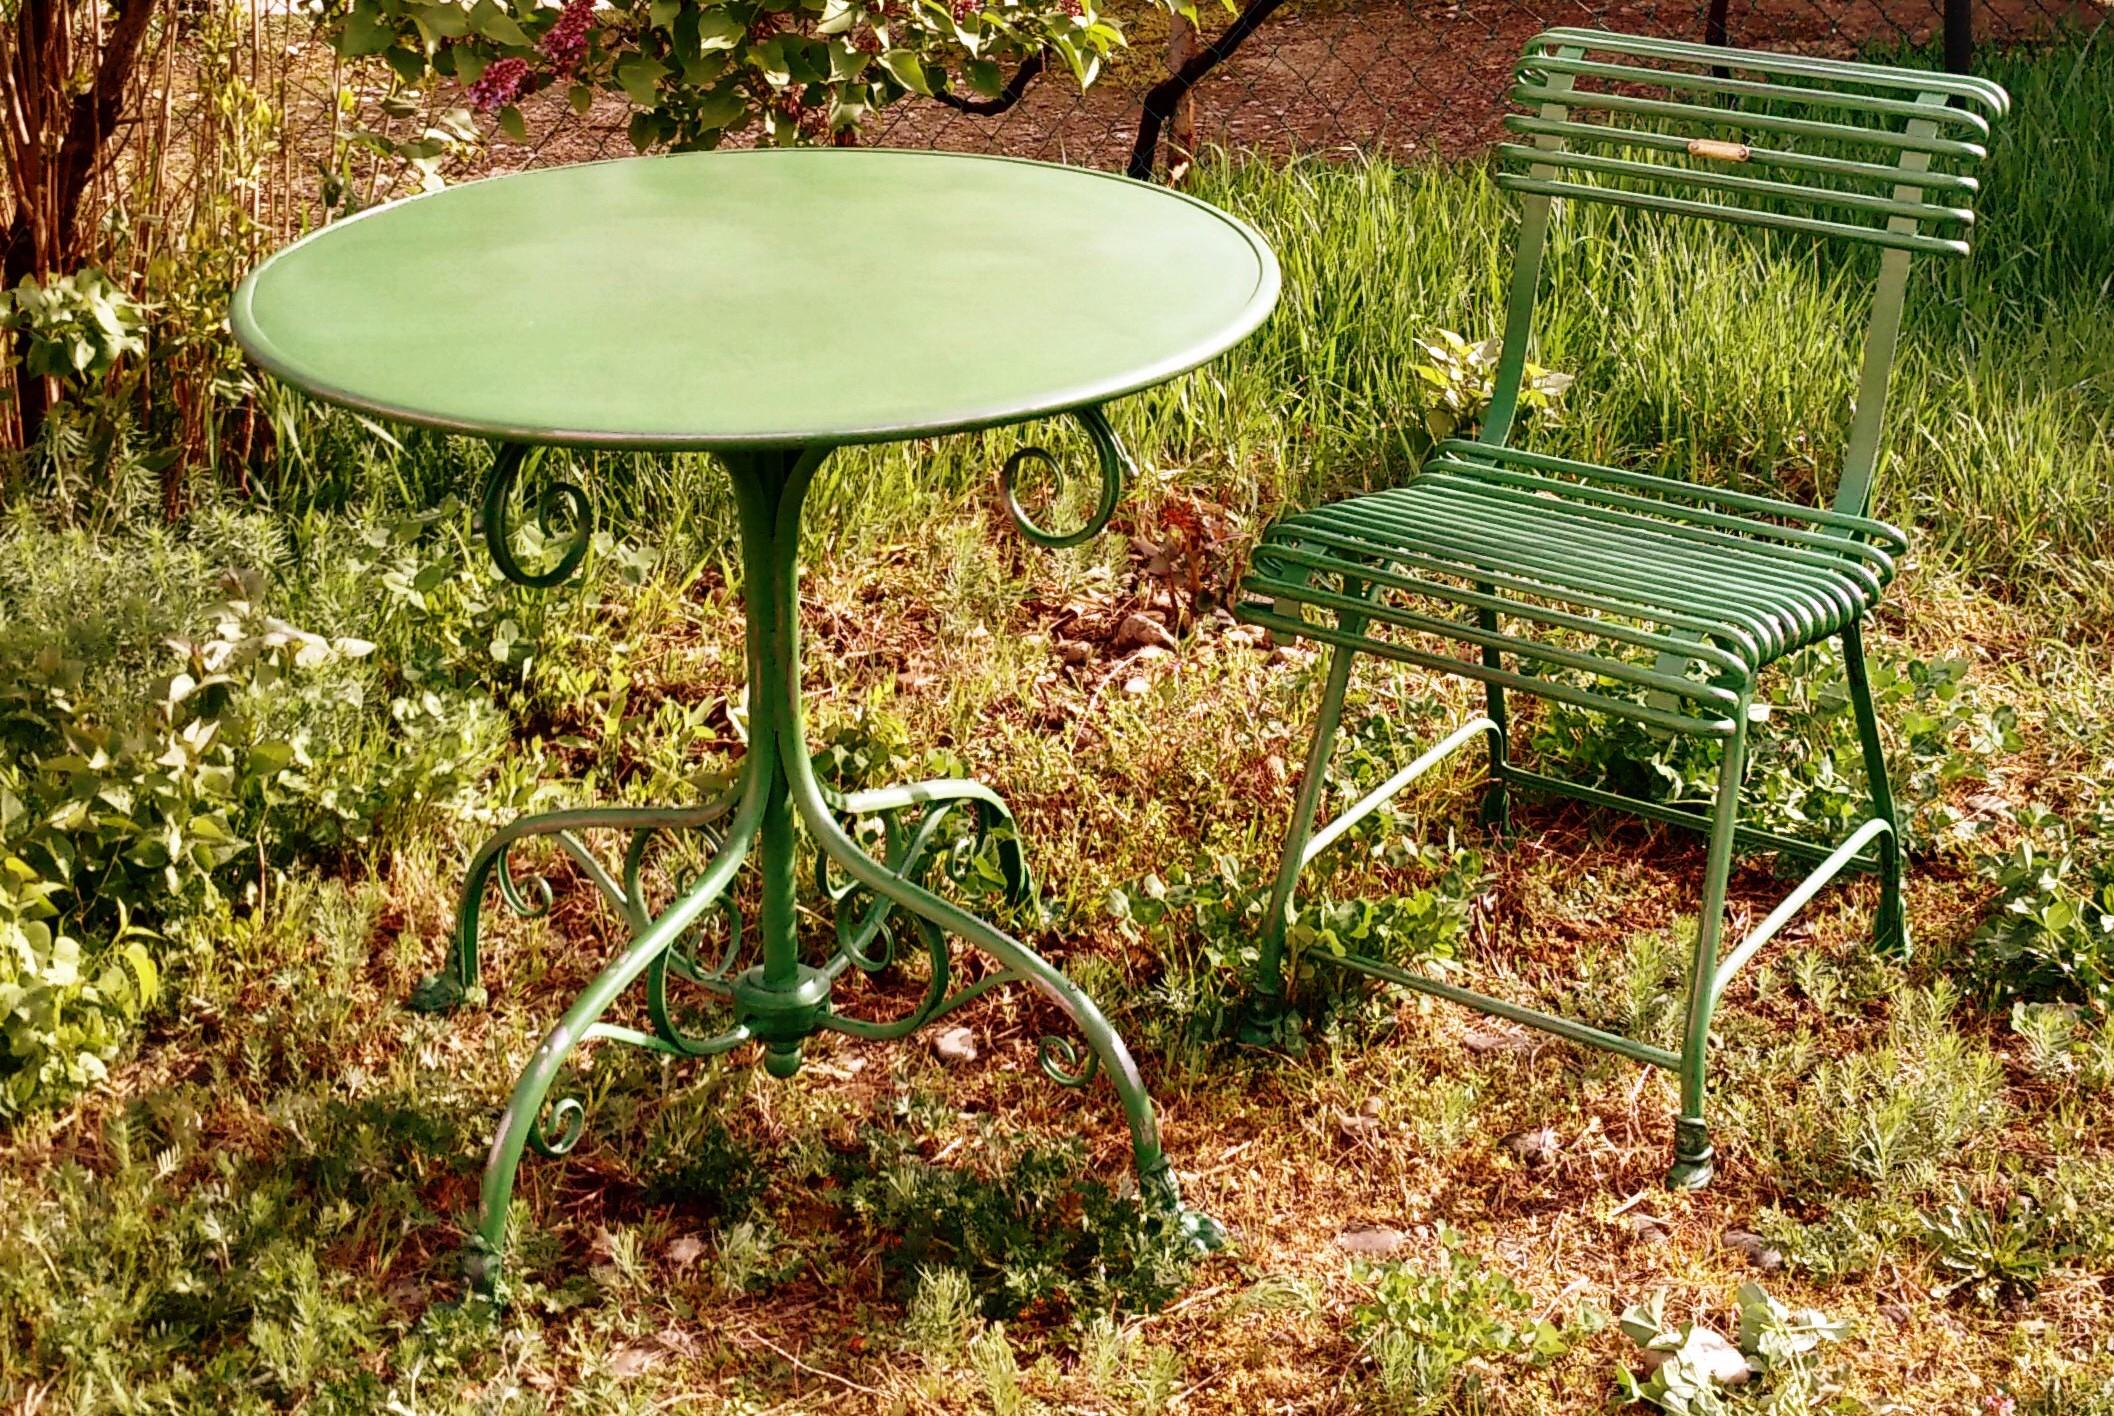 T80 - Table De Jardin Ronde - Pieds Griffe dedans Griffe De Jardin